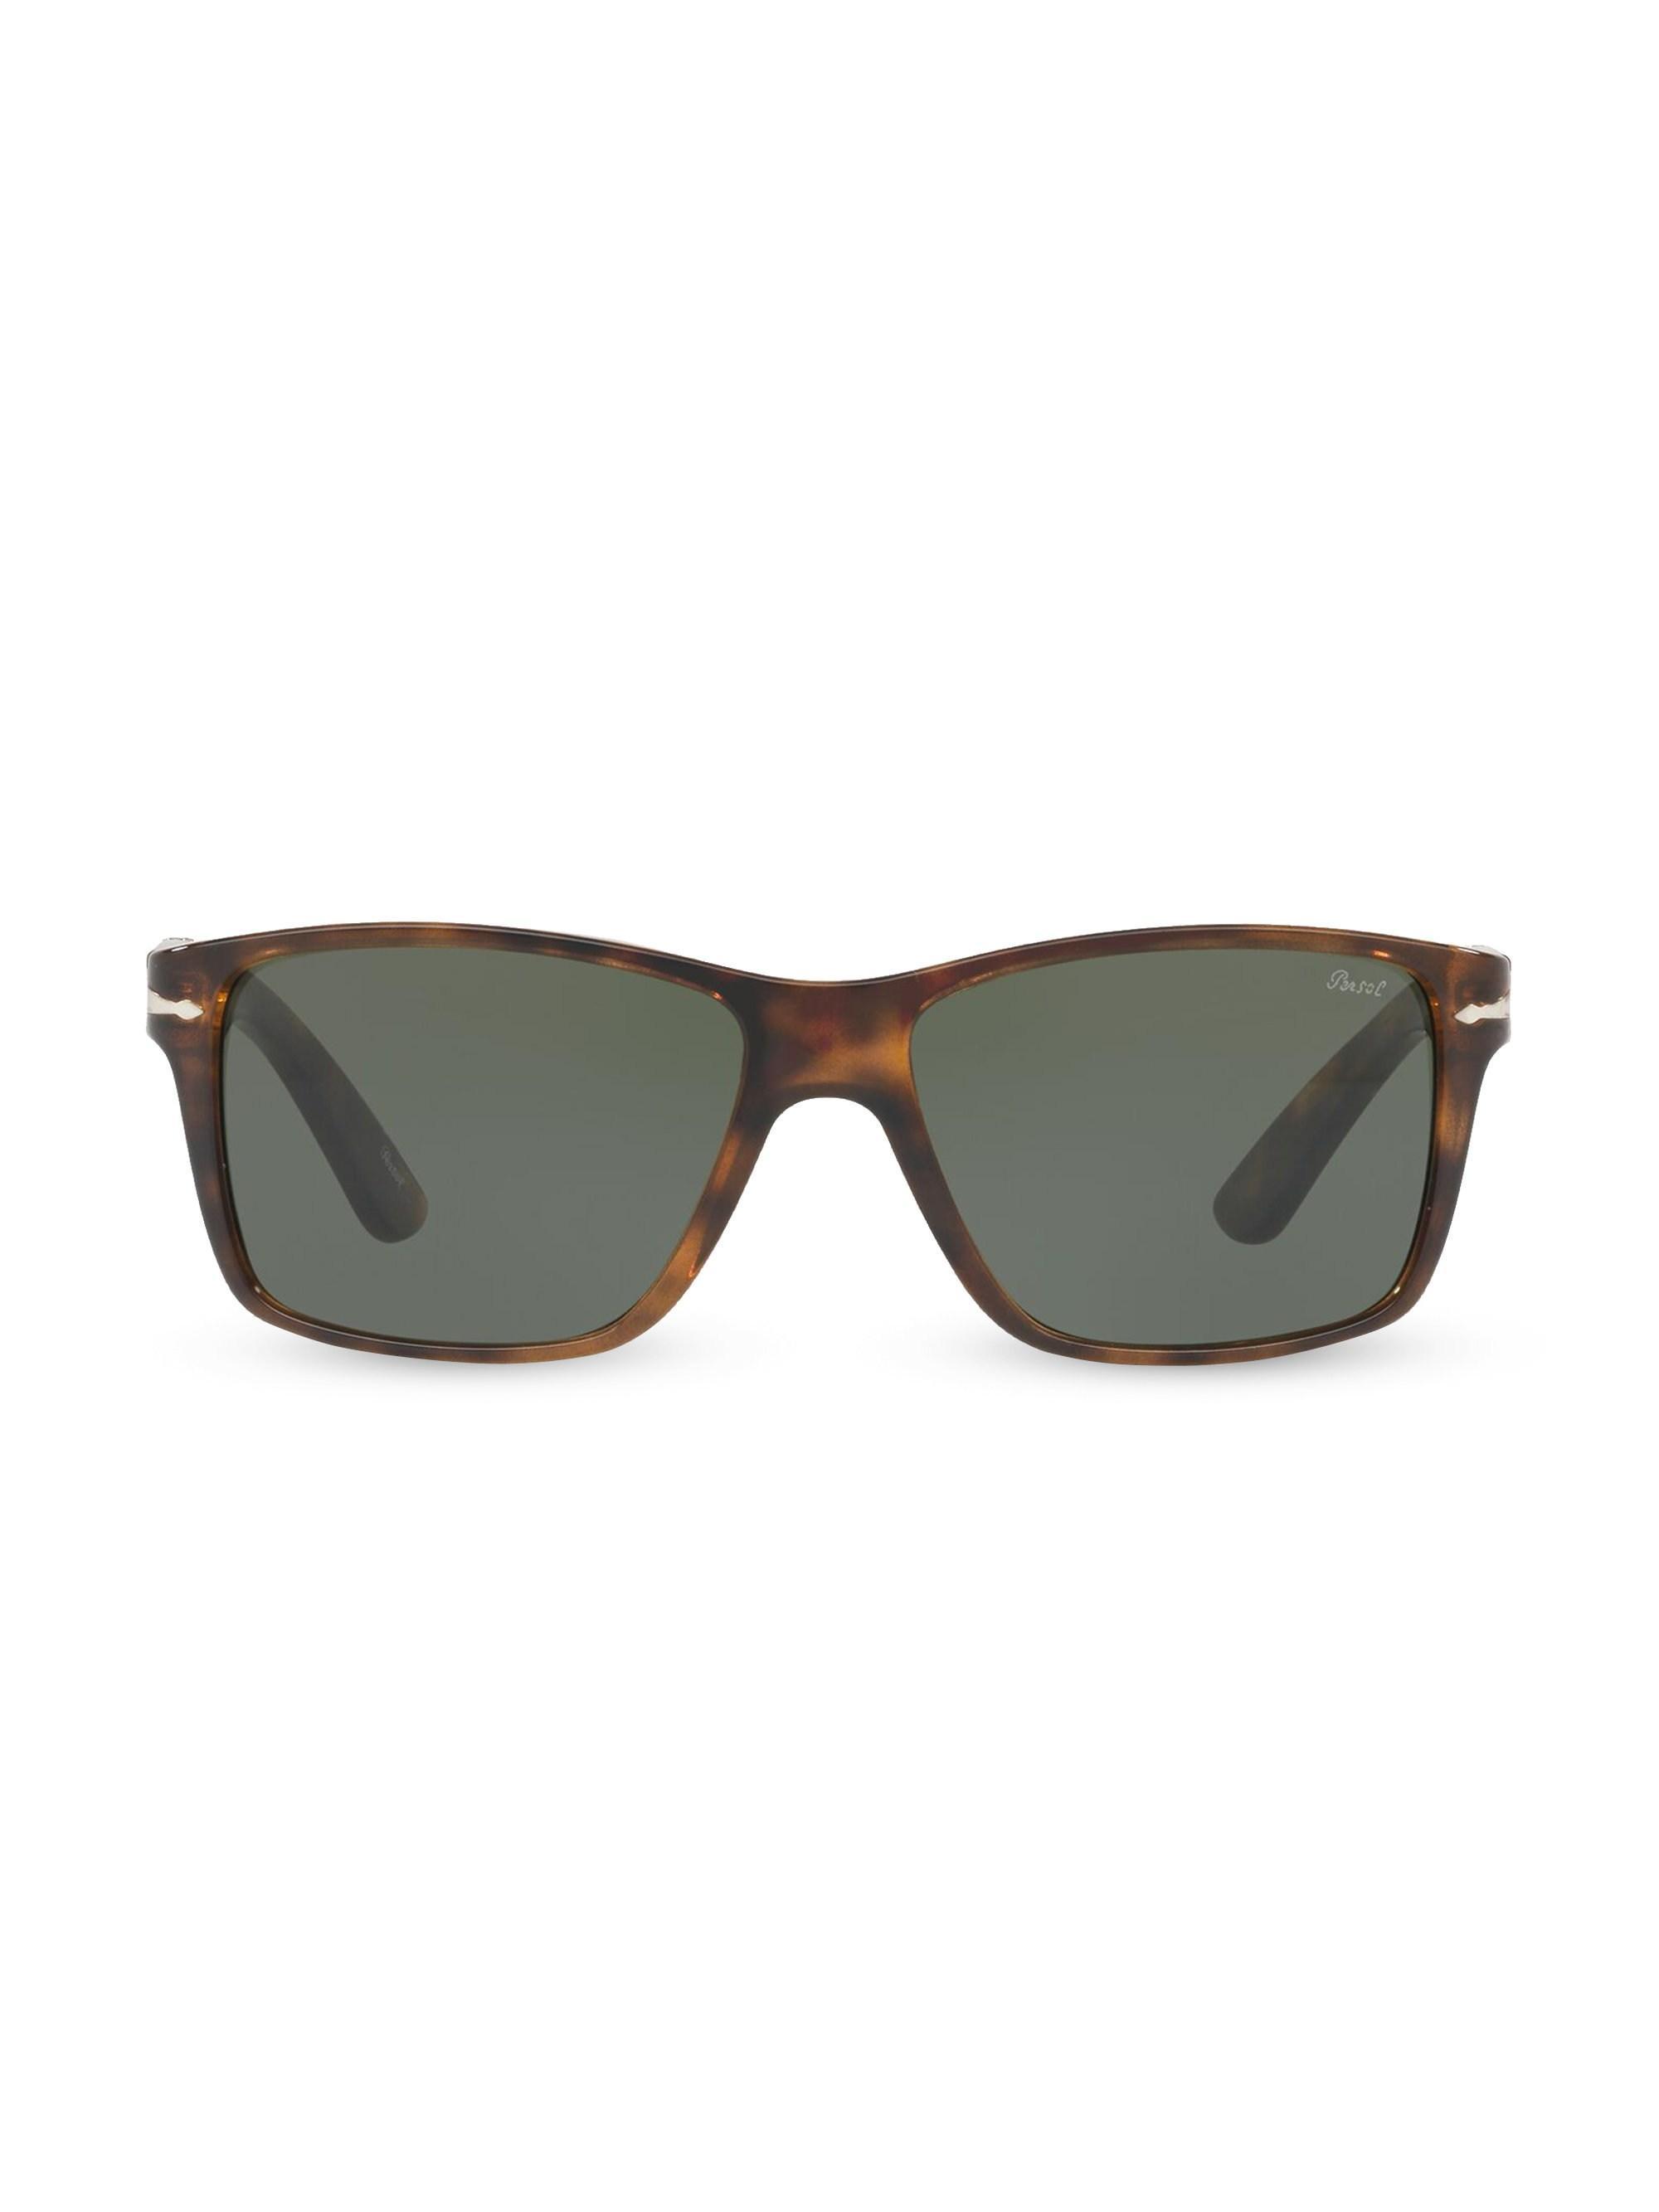 cbe089294f131 Persol - Brown Men s 58mm Rectangular Sunglasses - Dark Havana for Men -  Lyst. View fullscreen